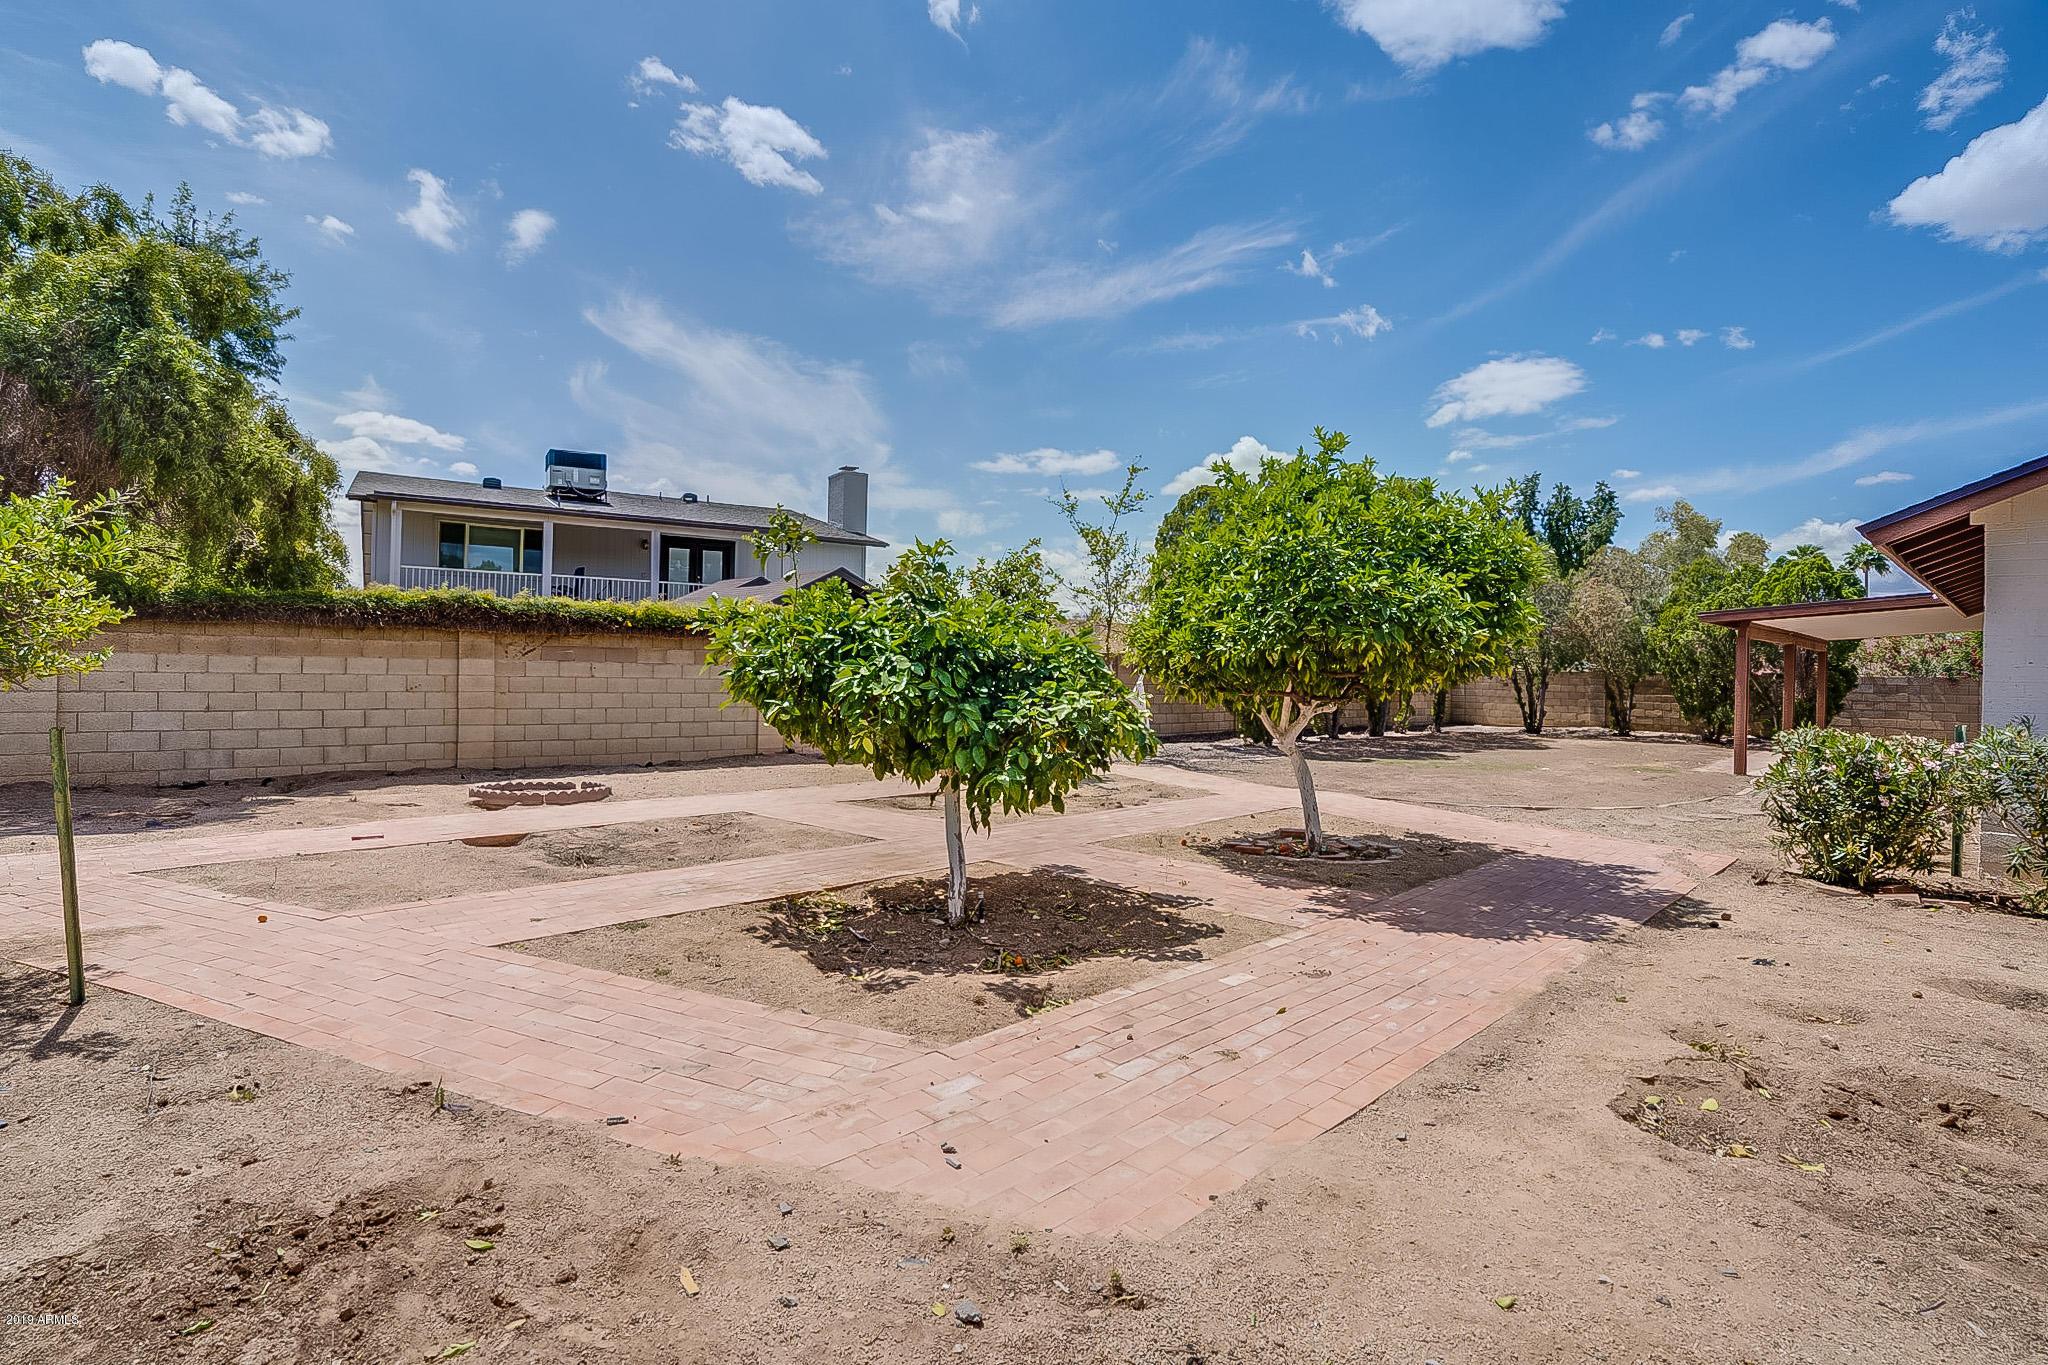 MLS 5911271 753 W NATAL Circle, Mesa, AZ 85210 West Mesa